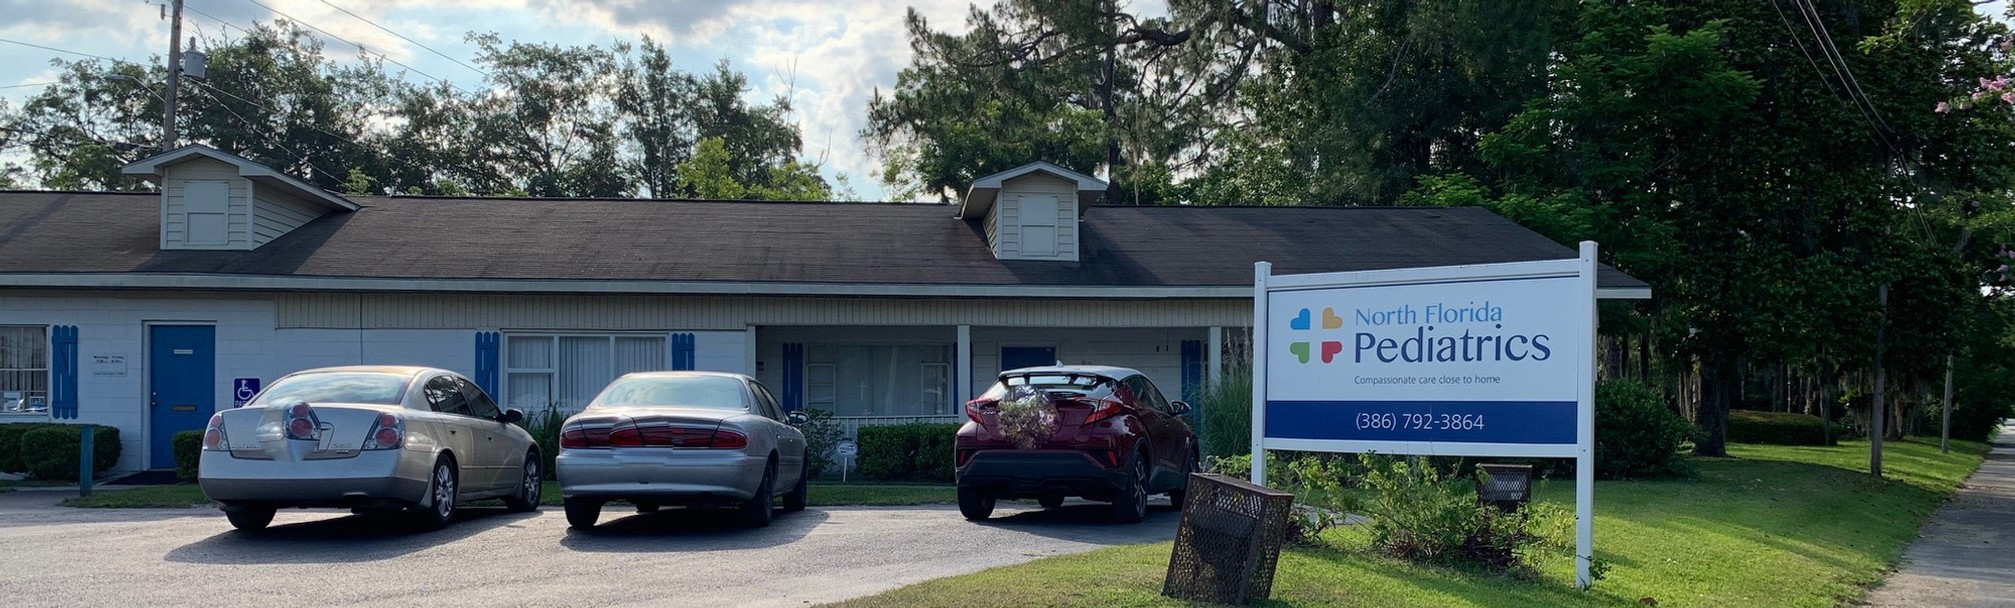 North Florida Pediatrics Jasper